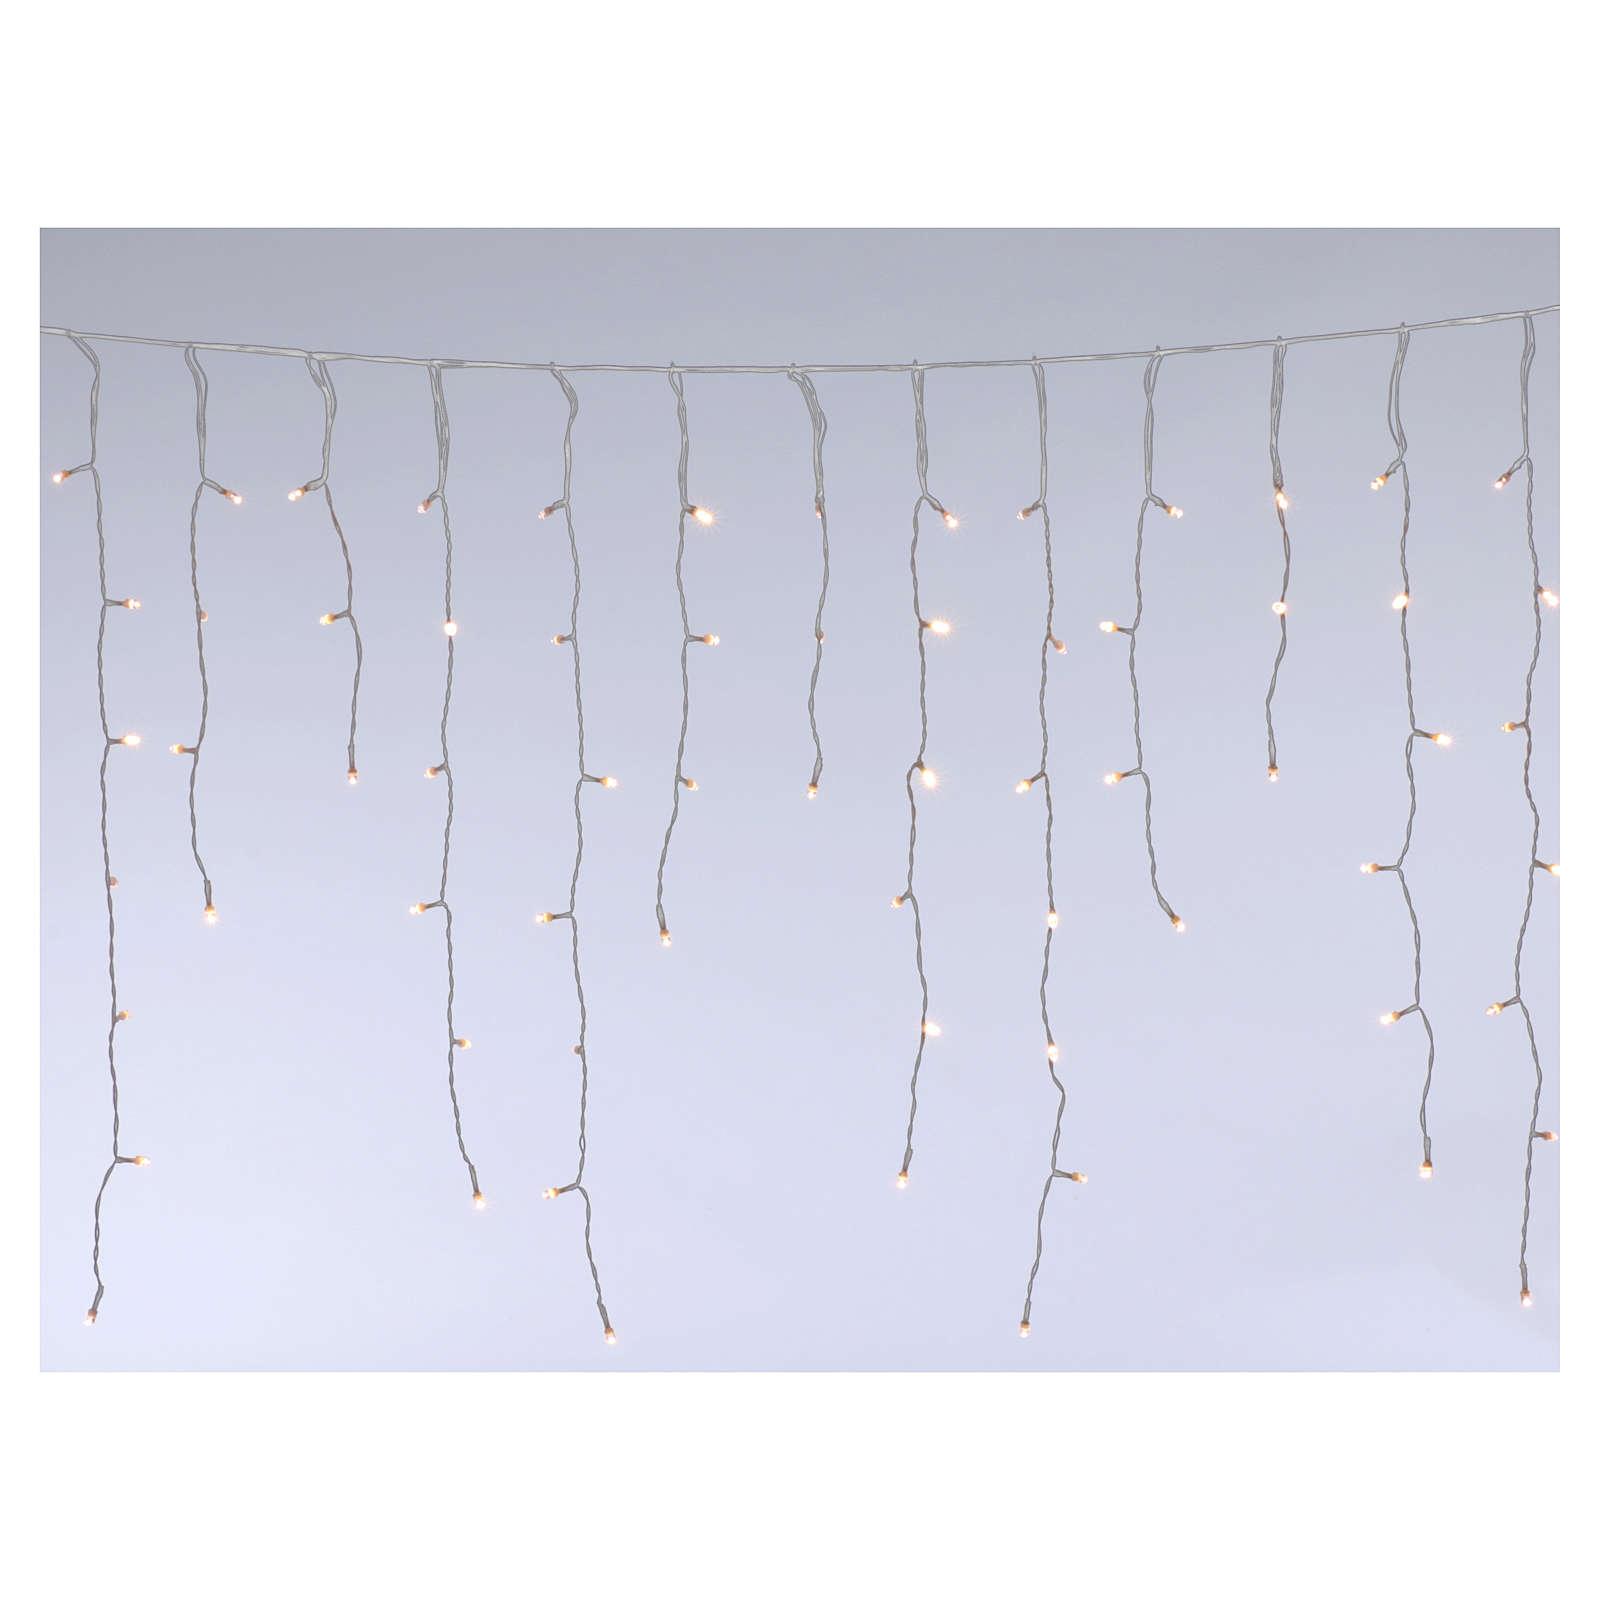 Stalactite light 180 mega leds warm white internal and external use 3